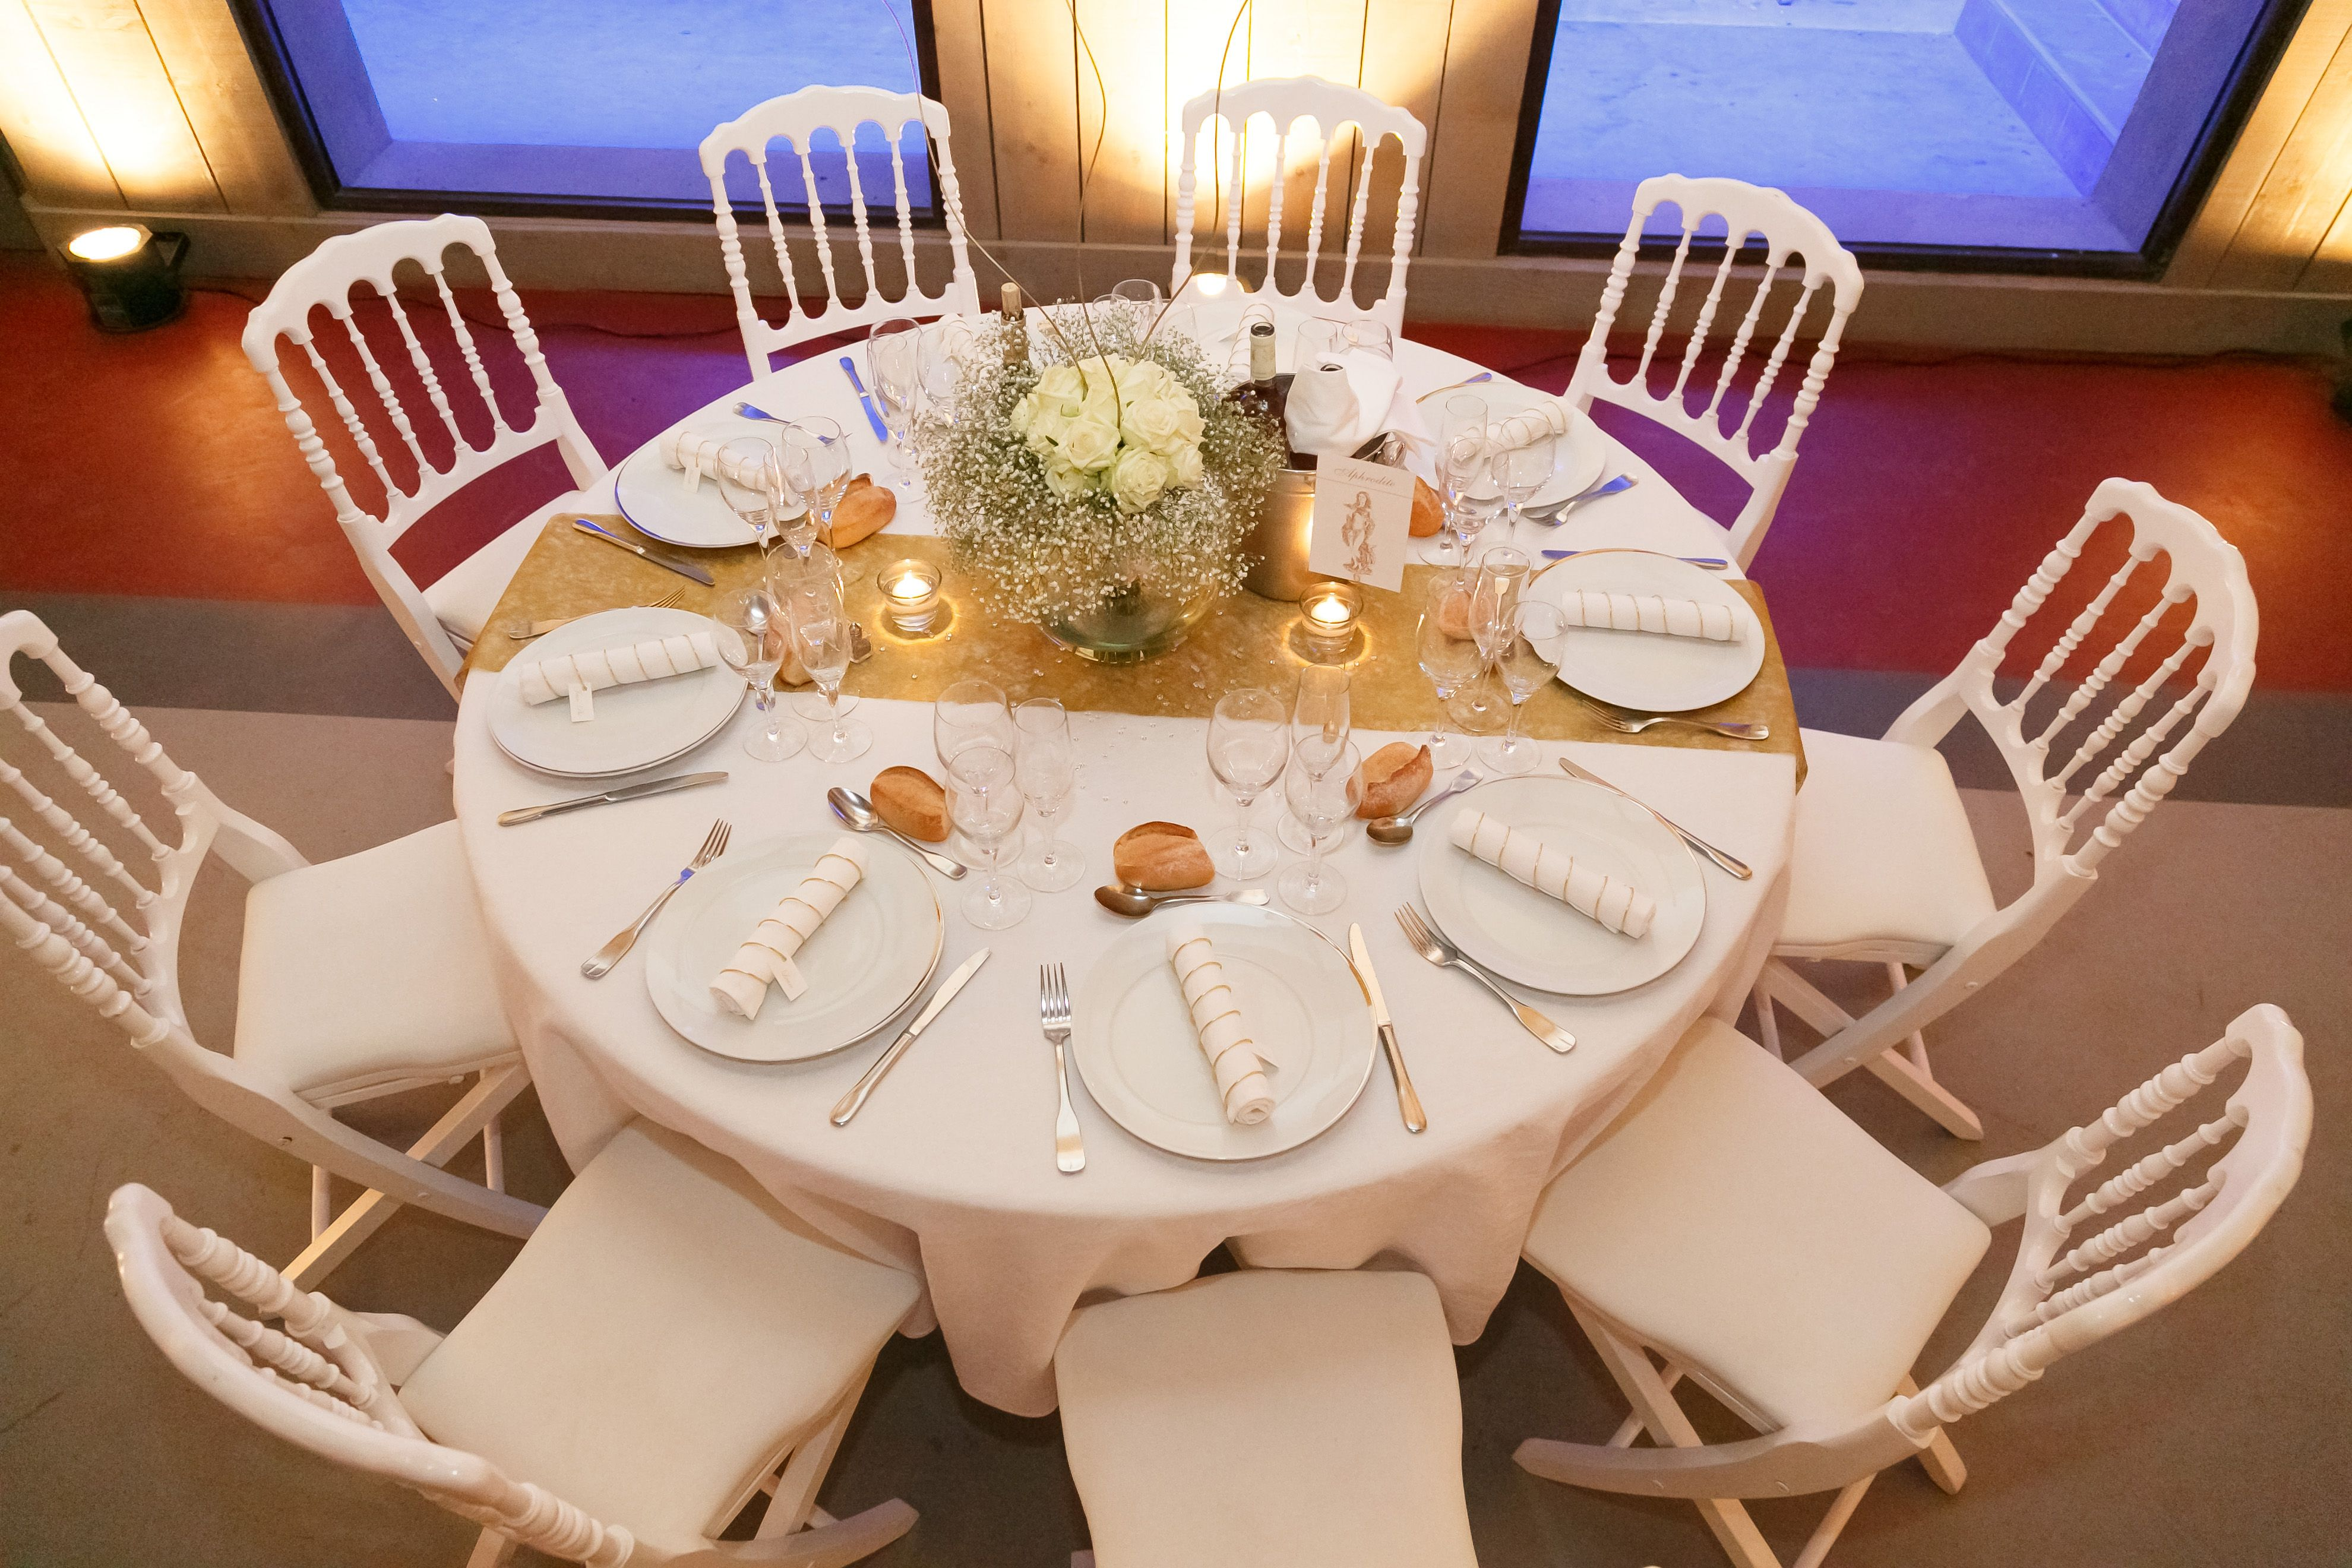 Décoration table, nom dieux grecs, mariage, blanc et or, roses blanches,